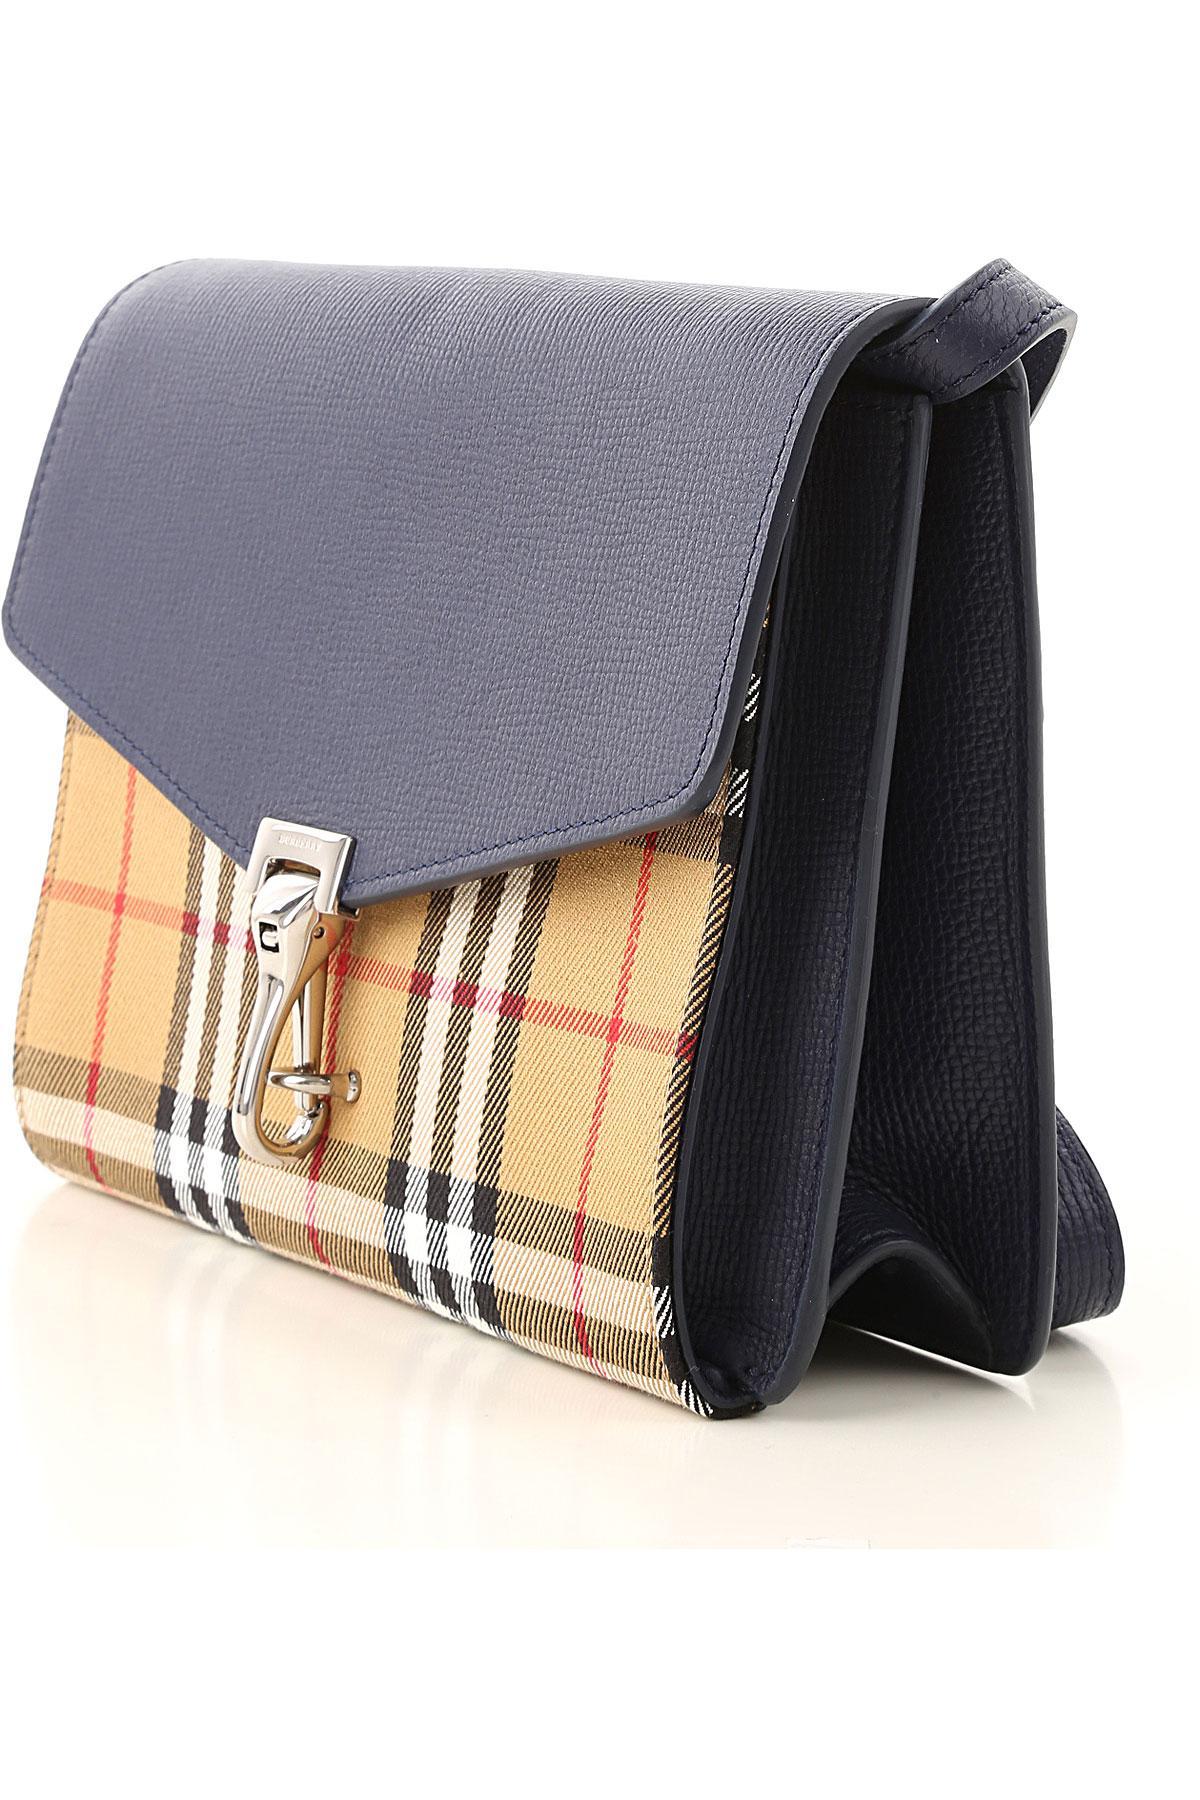 d8fa2c823083 Lyst - Burberry Shoulder Bag For Women in Blue